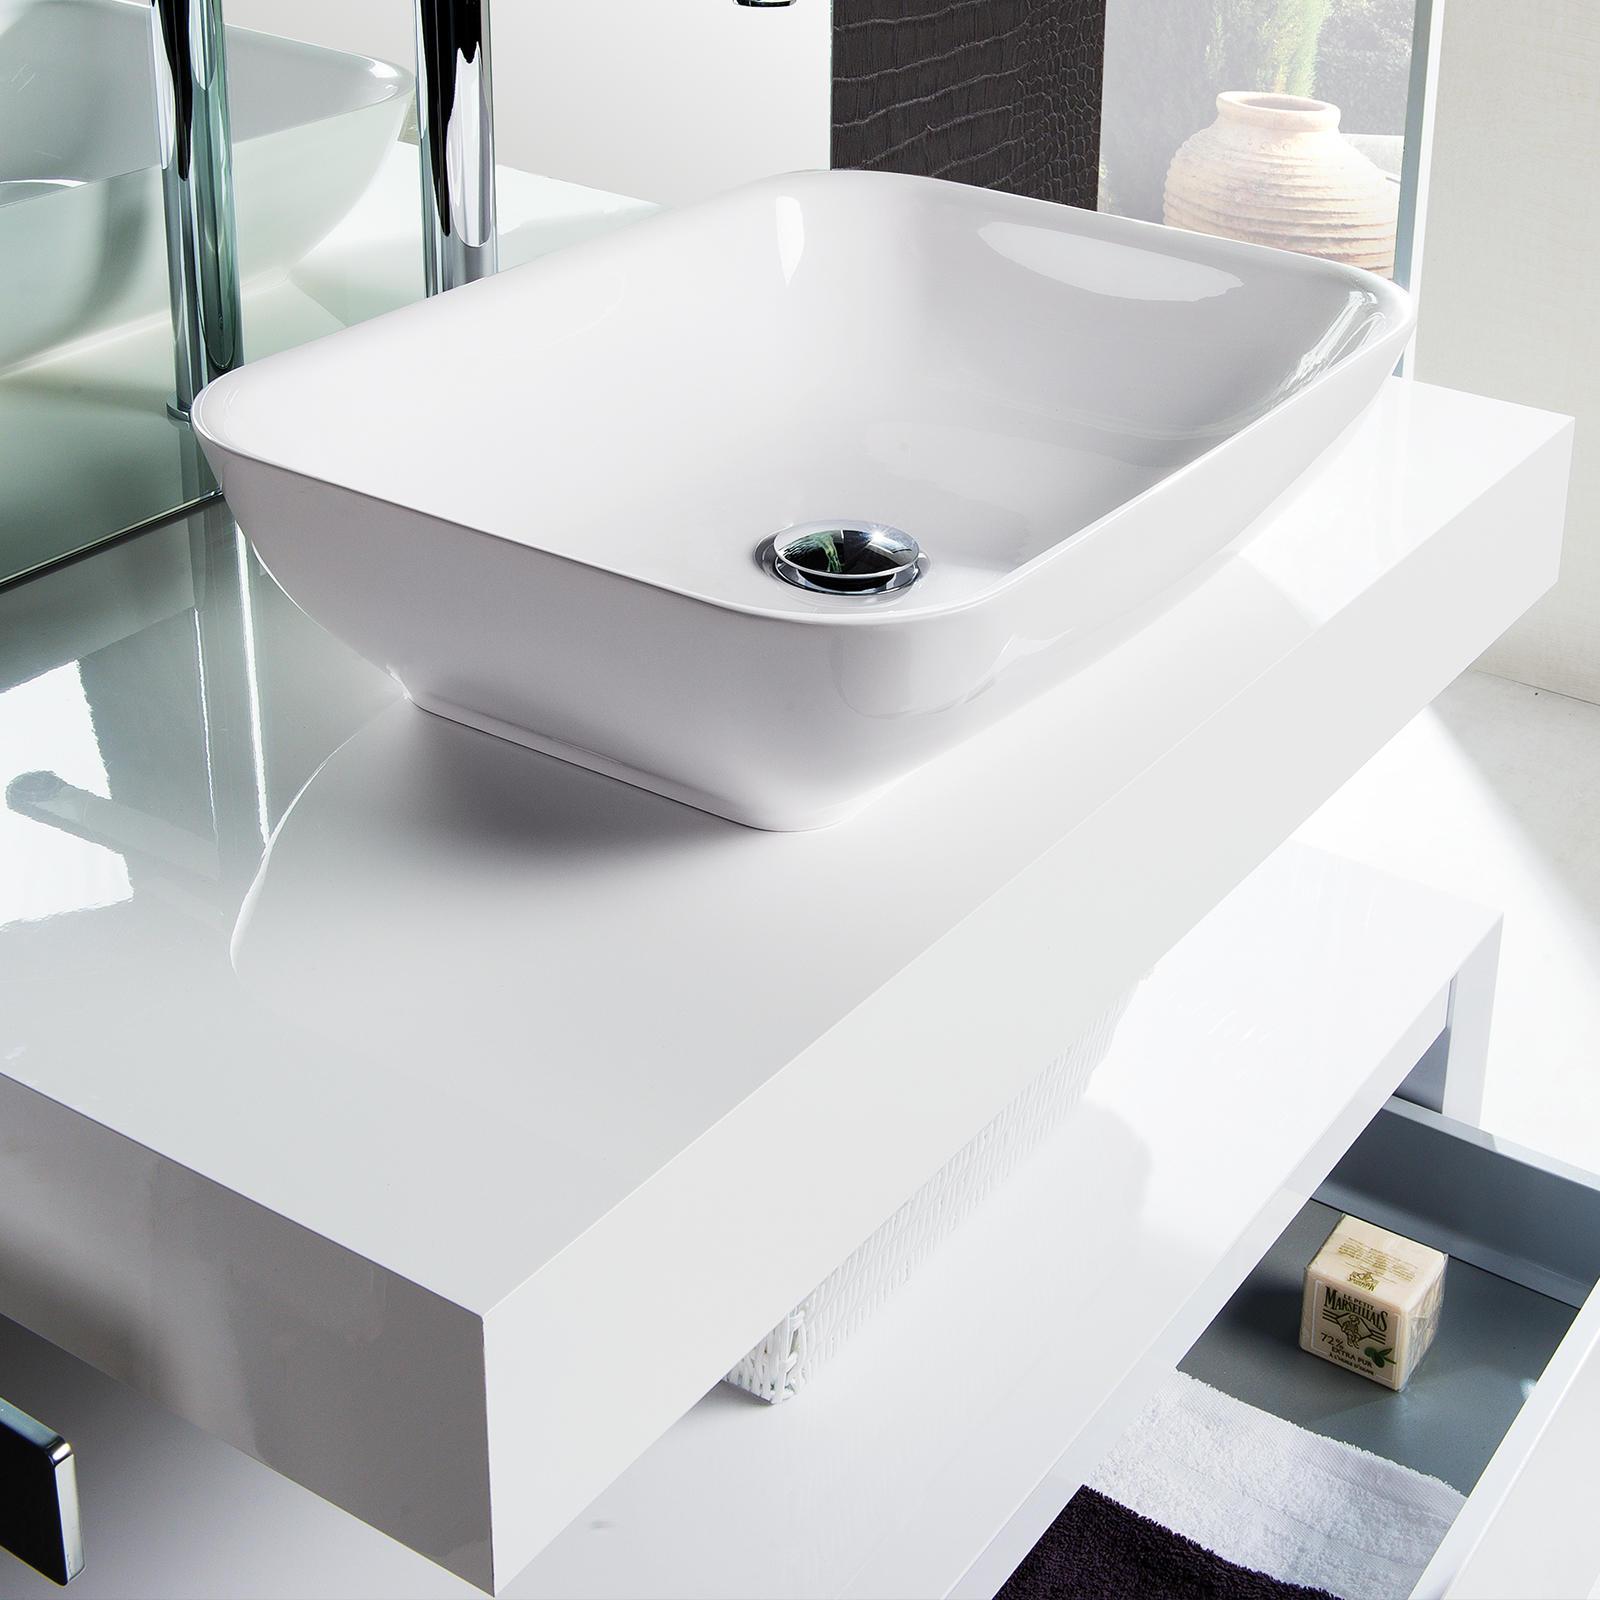 Plan De Toilette Epais Vasque Meubles De Salle De Bains Baignoires Fabricant Francais Cedam